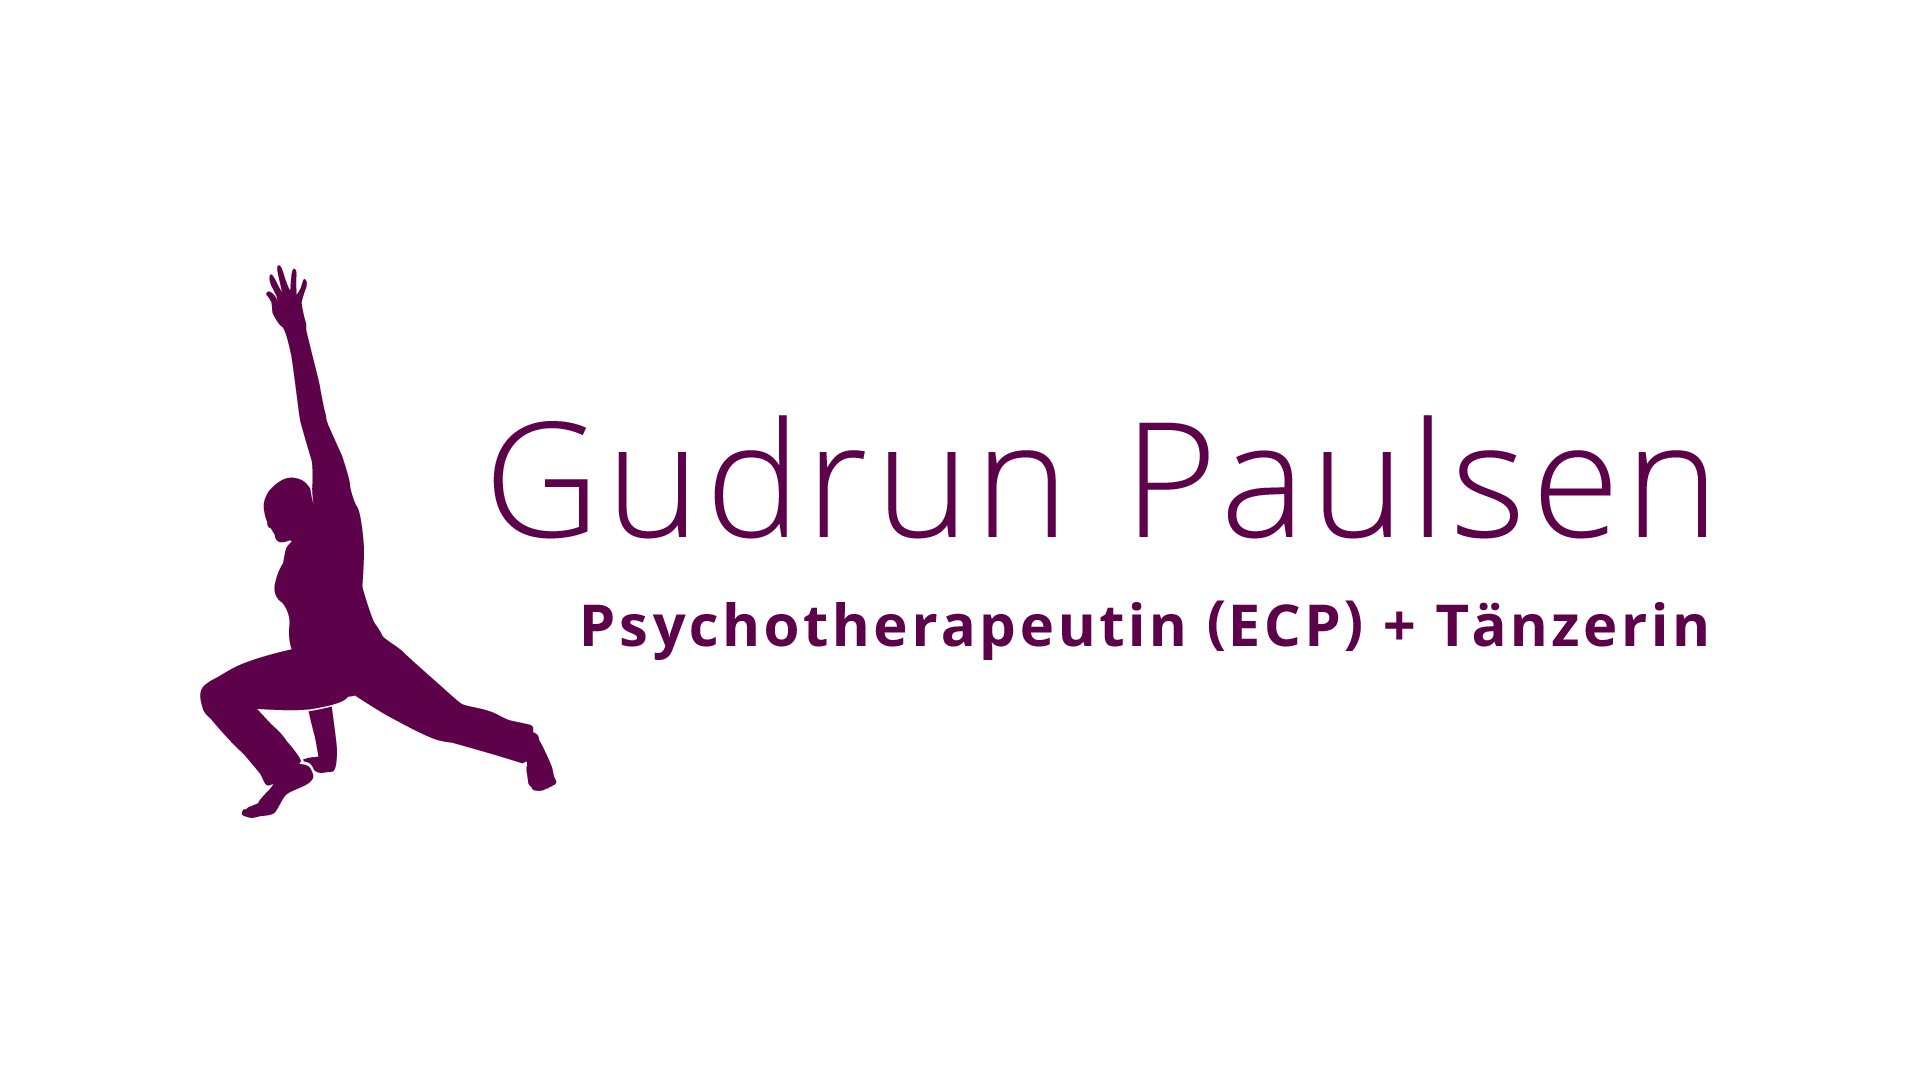 Gudrun Paulsen, Luxemburg Logo, Geschäftspapiere, Imageflyer, Web